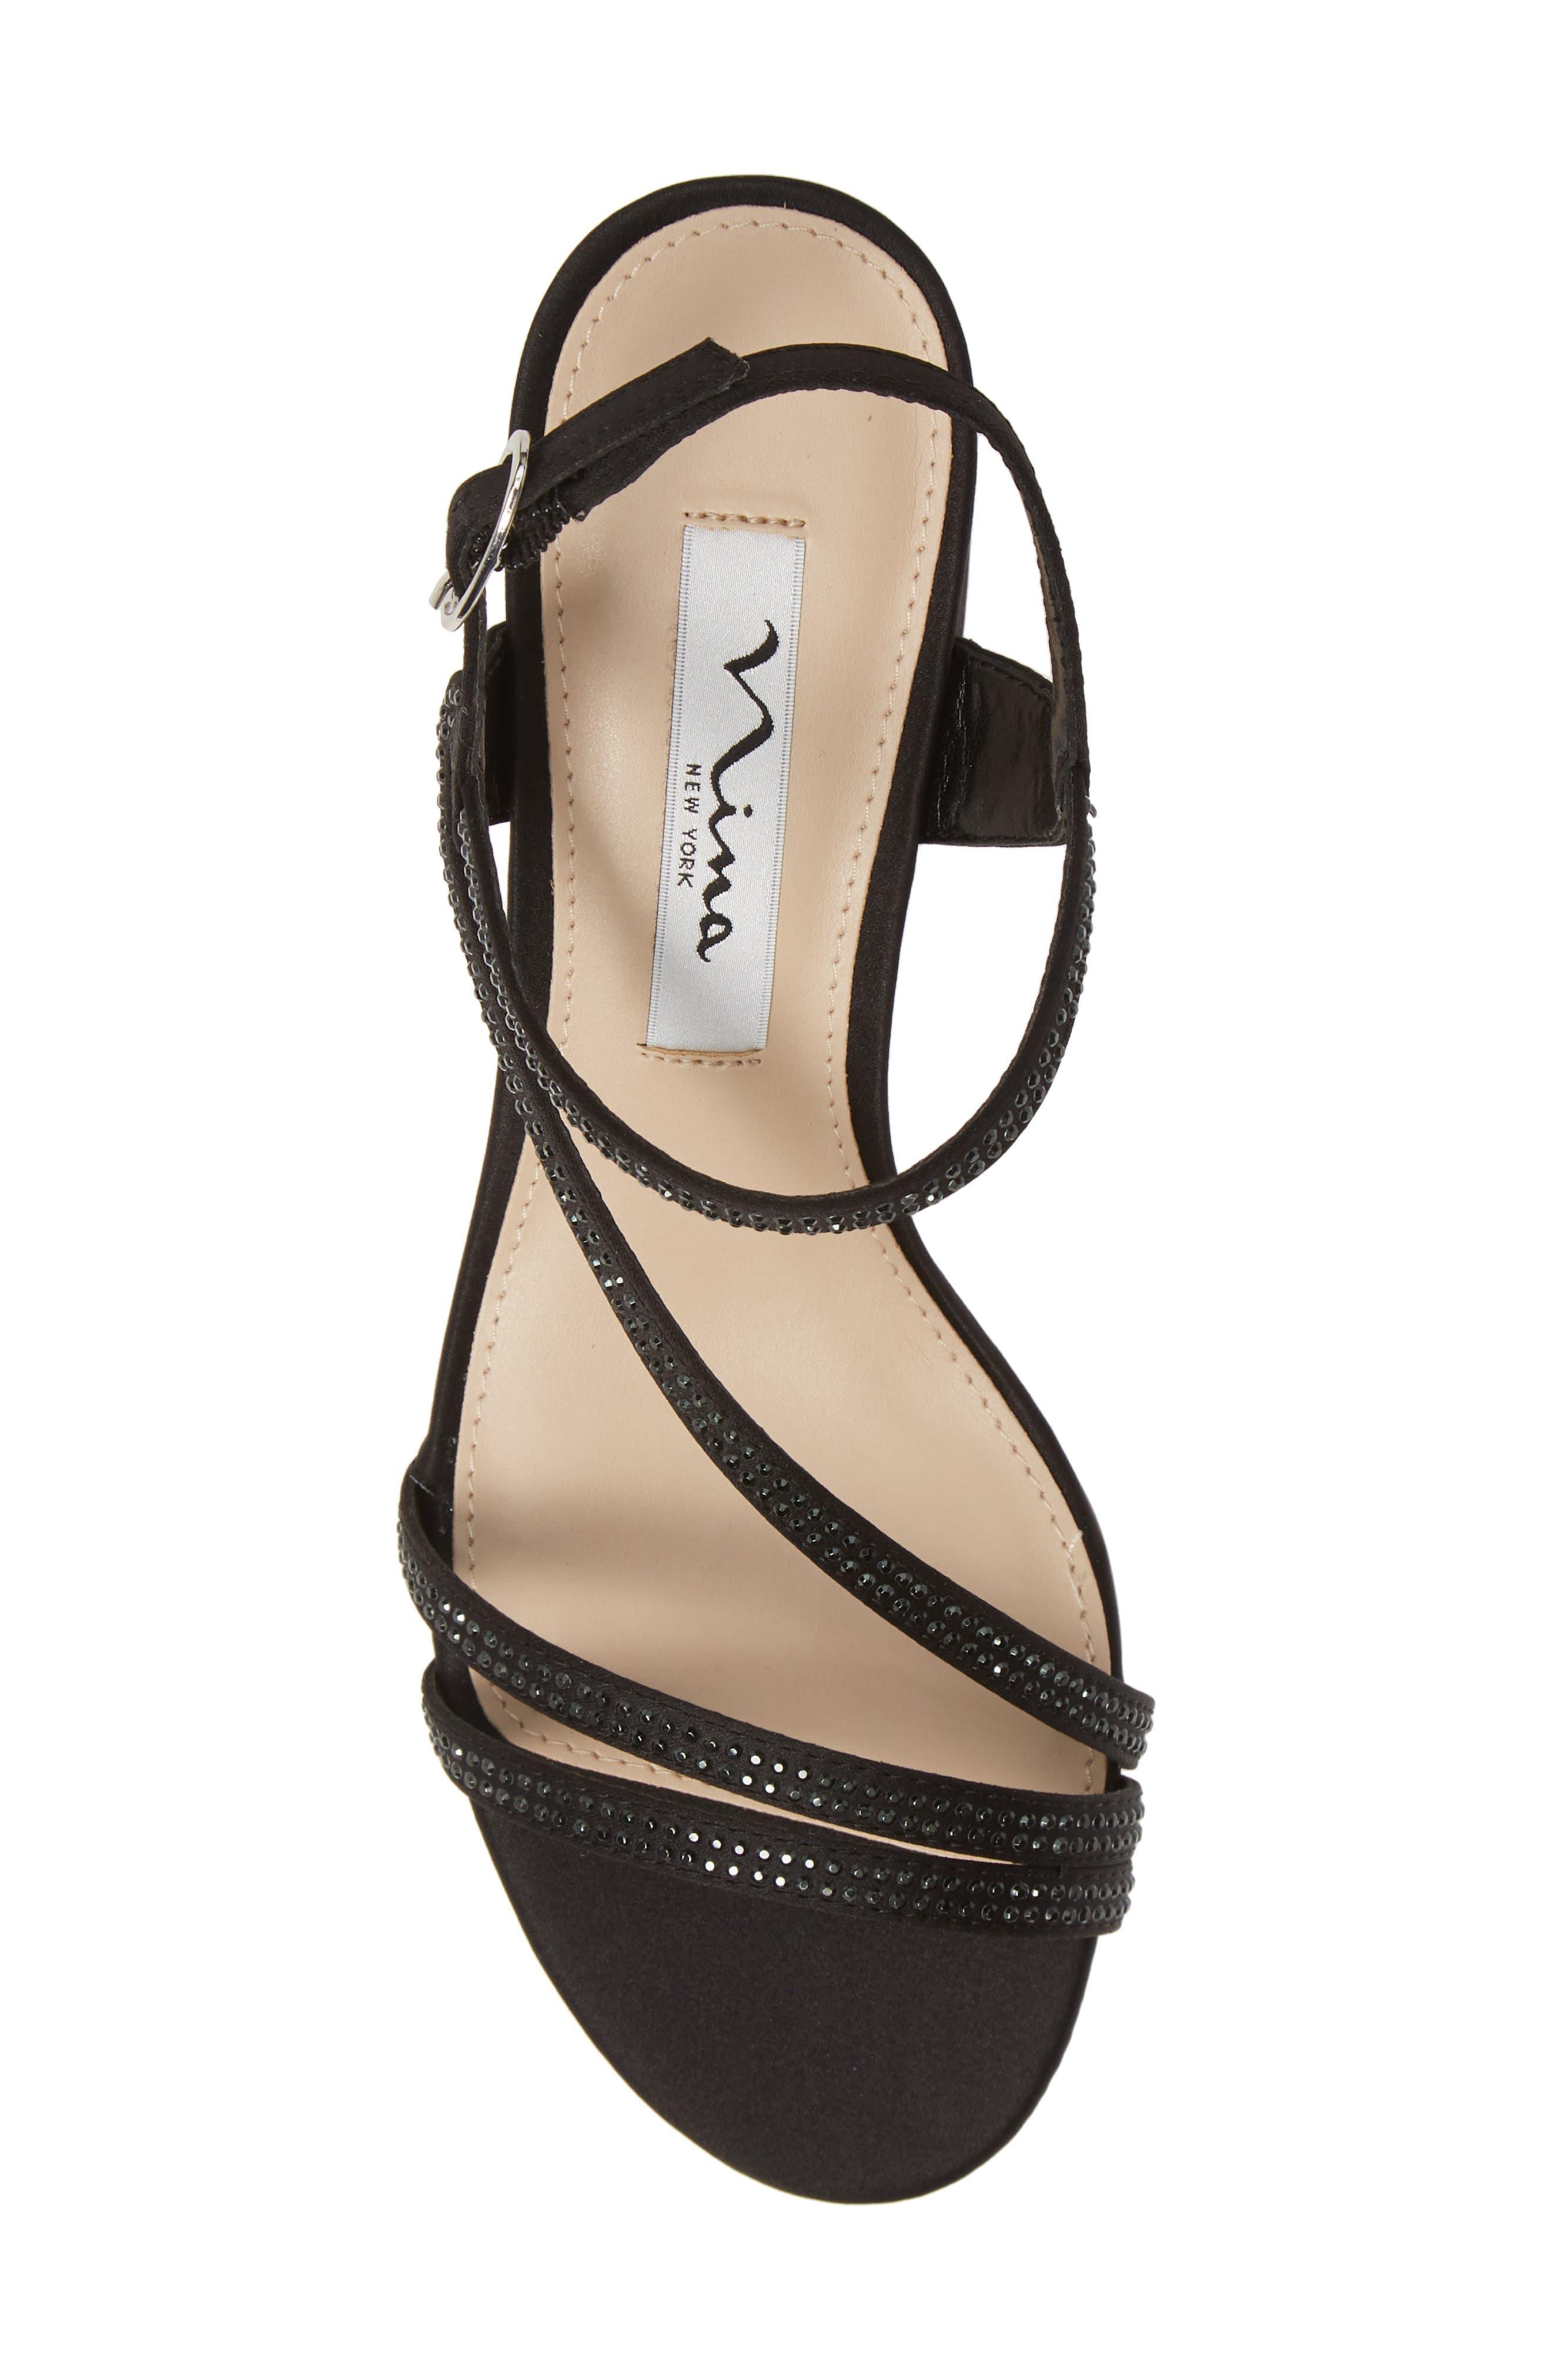 NINA, Naura Block Heel Sandal, Alternate thumbnail 5, color, BLACK SATIN